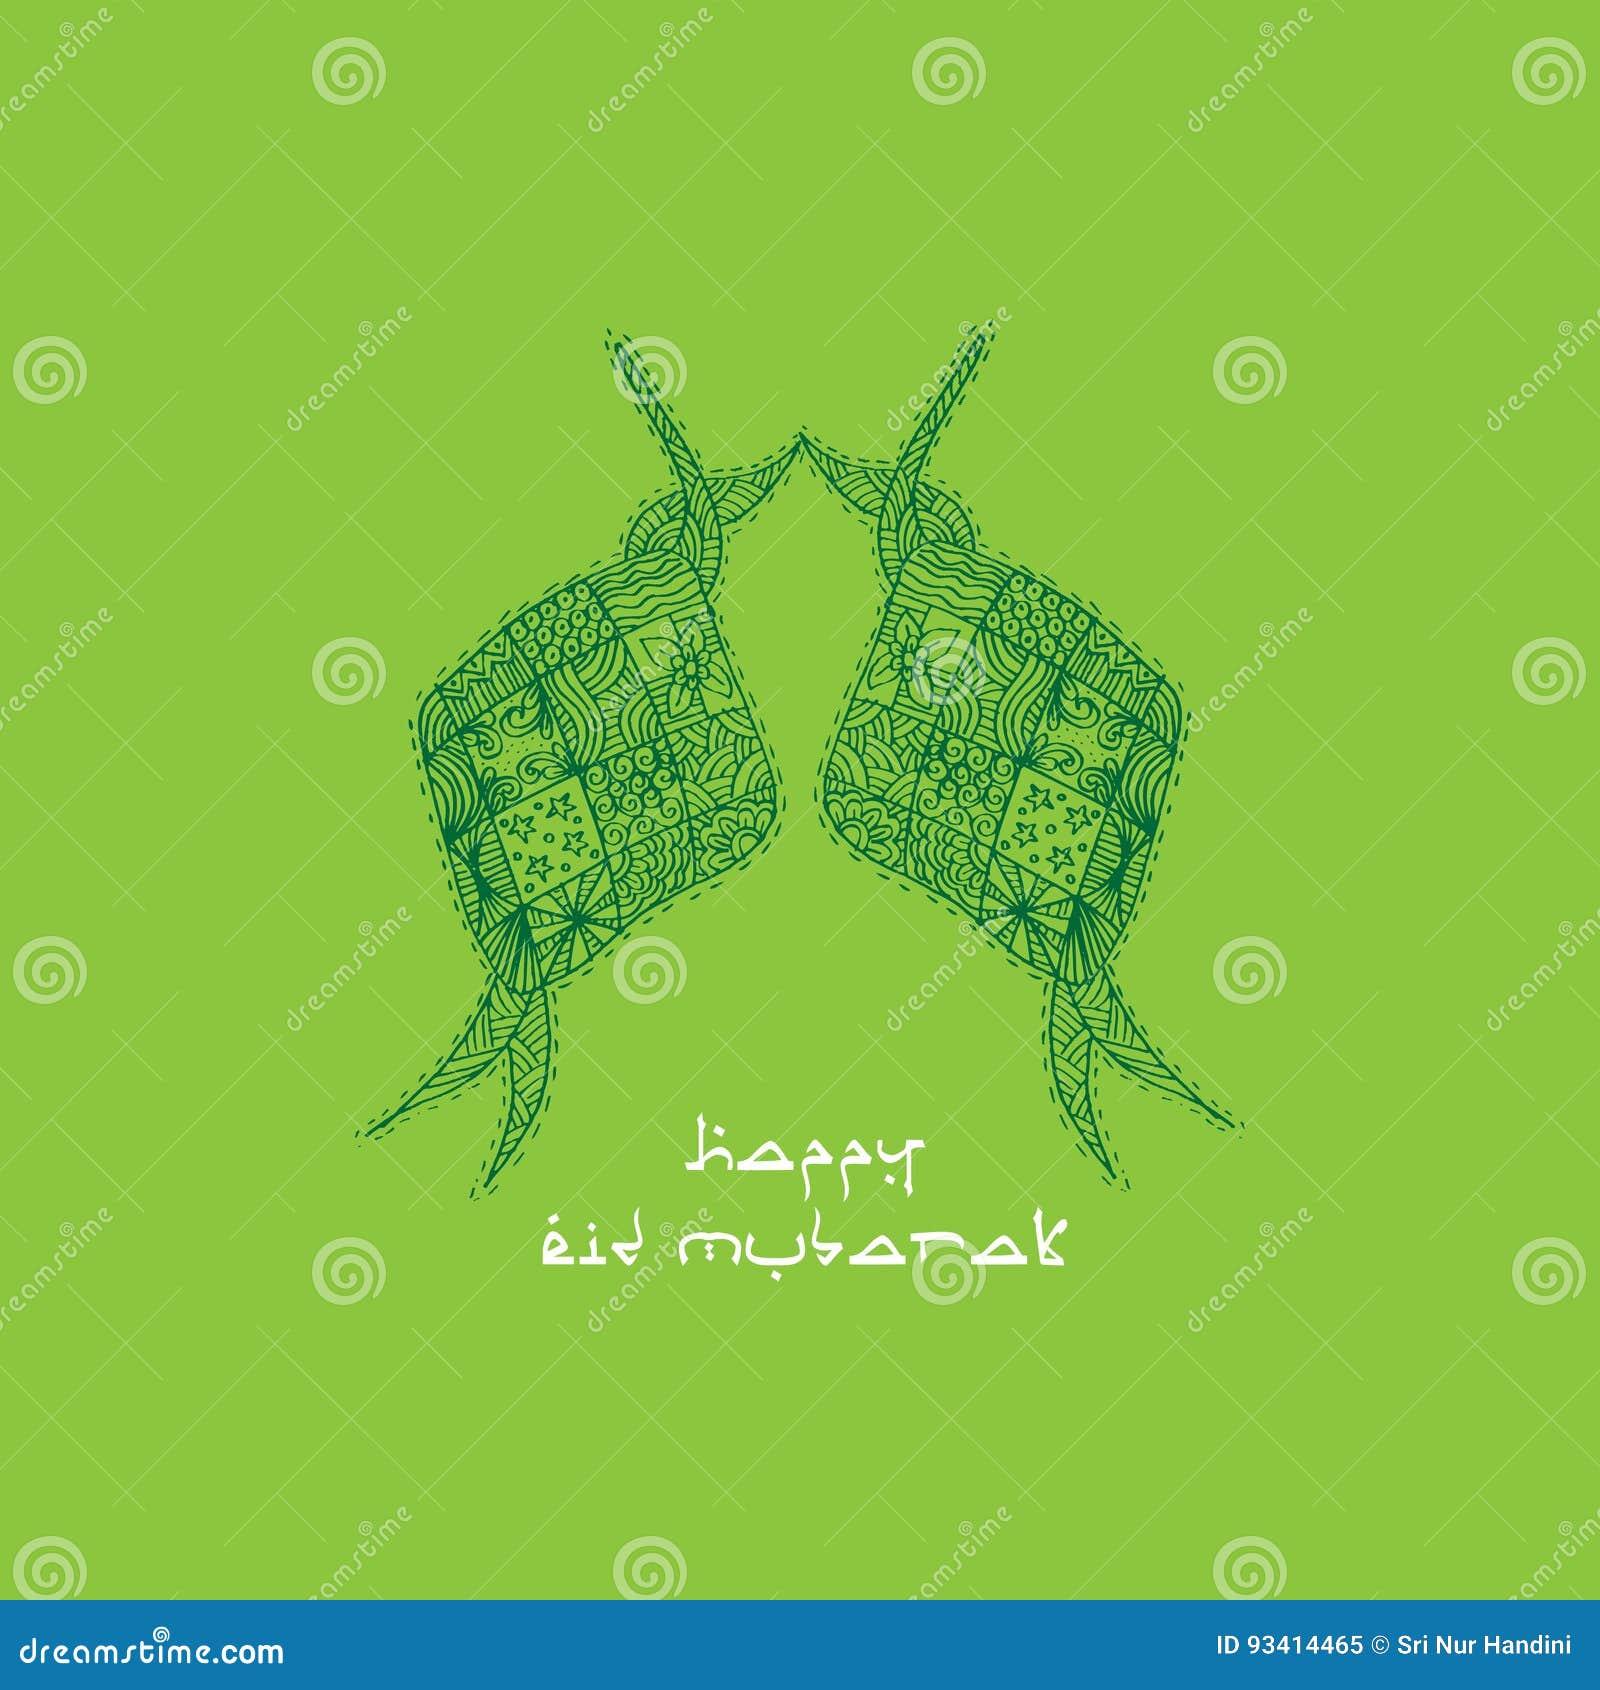 Islamic greeting card eid mubarak stock illustration download islamic greeting card eid mubarak stock illustration illustration of celebration indonesian m4hsunfo